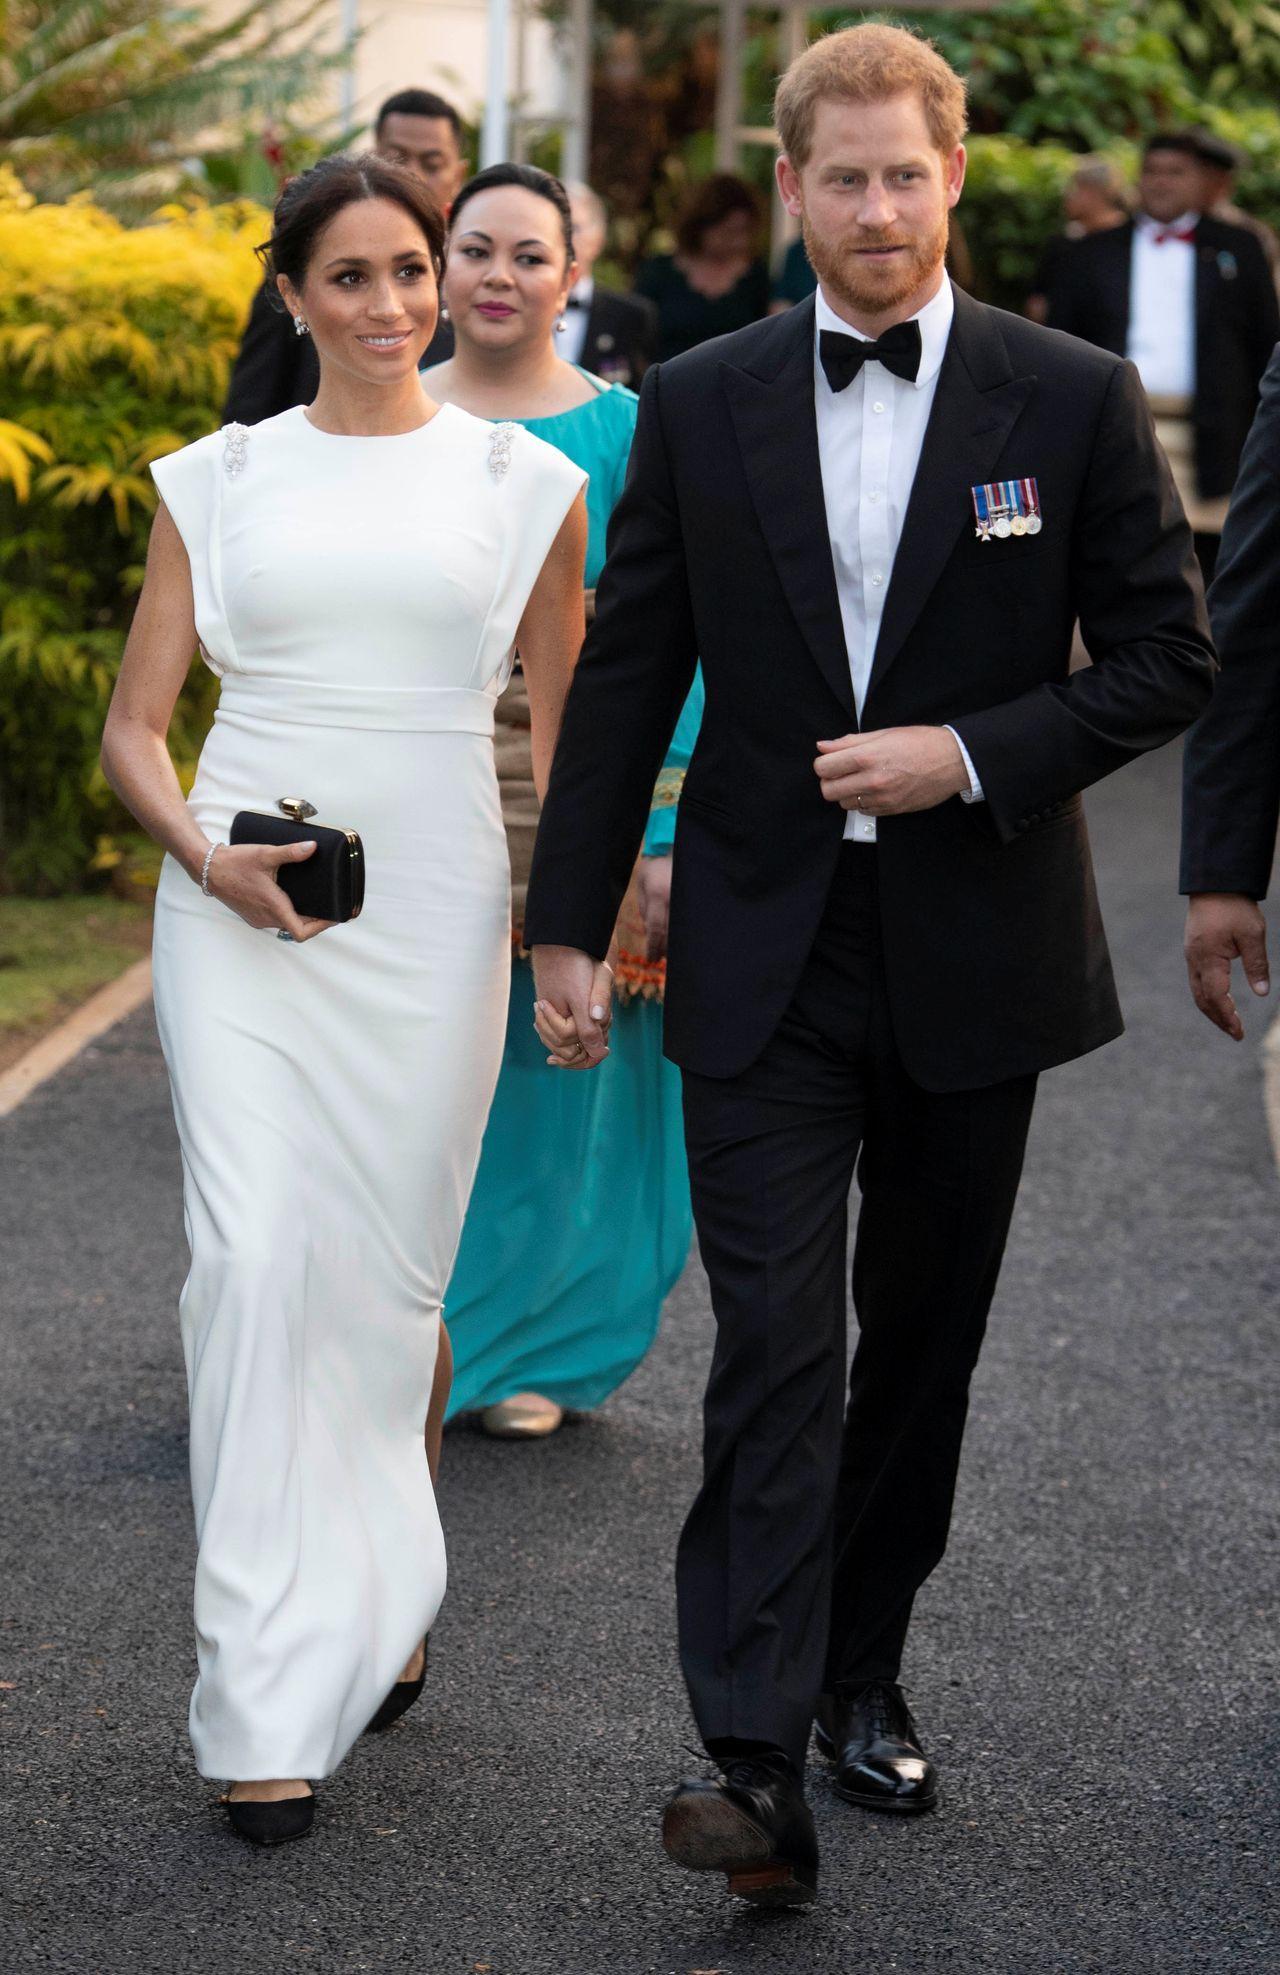 Meghan Markle i Harry w eleganckich strojach.